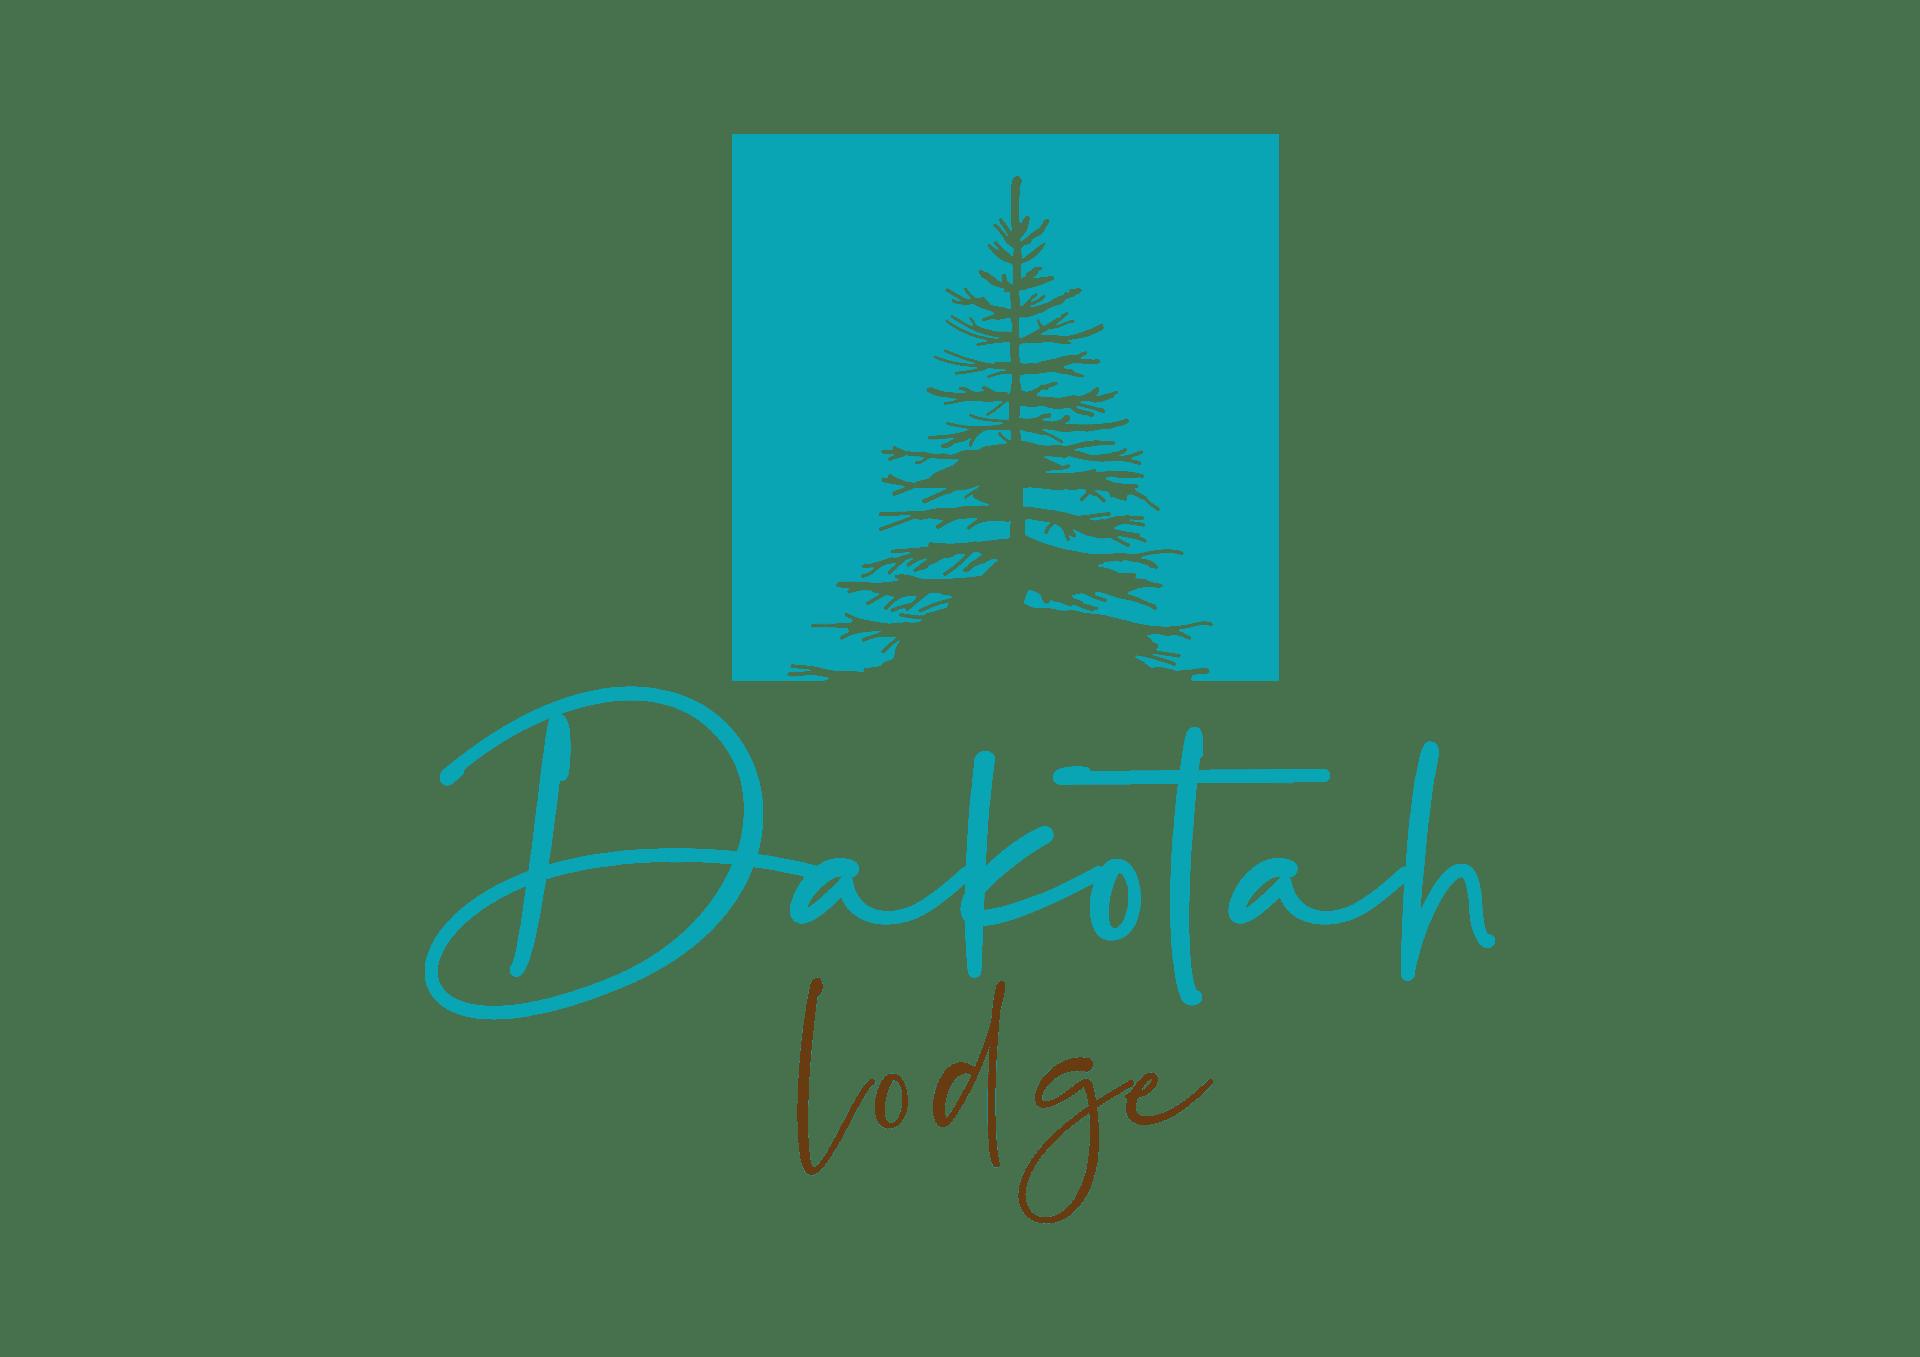 FF-lmk-Dakotah-Lodge-LO_high-01-w1920.png